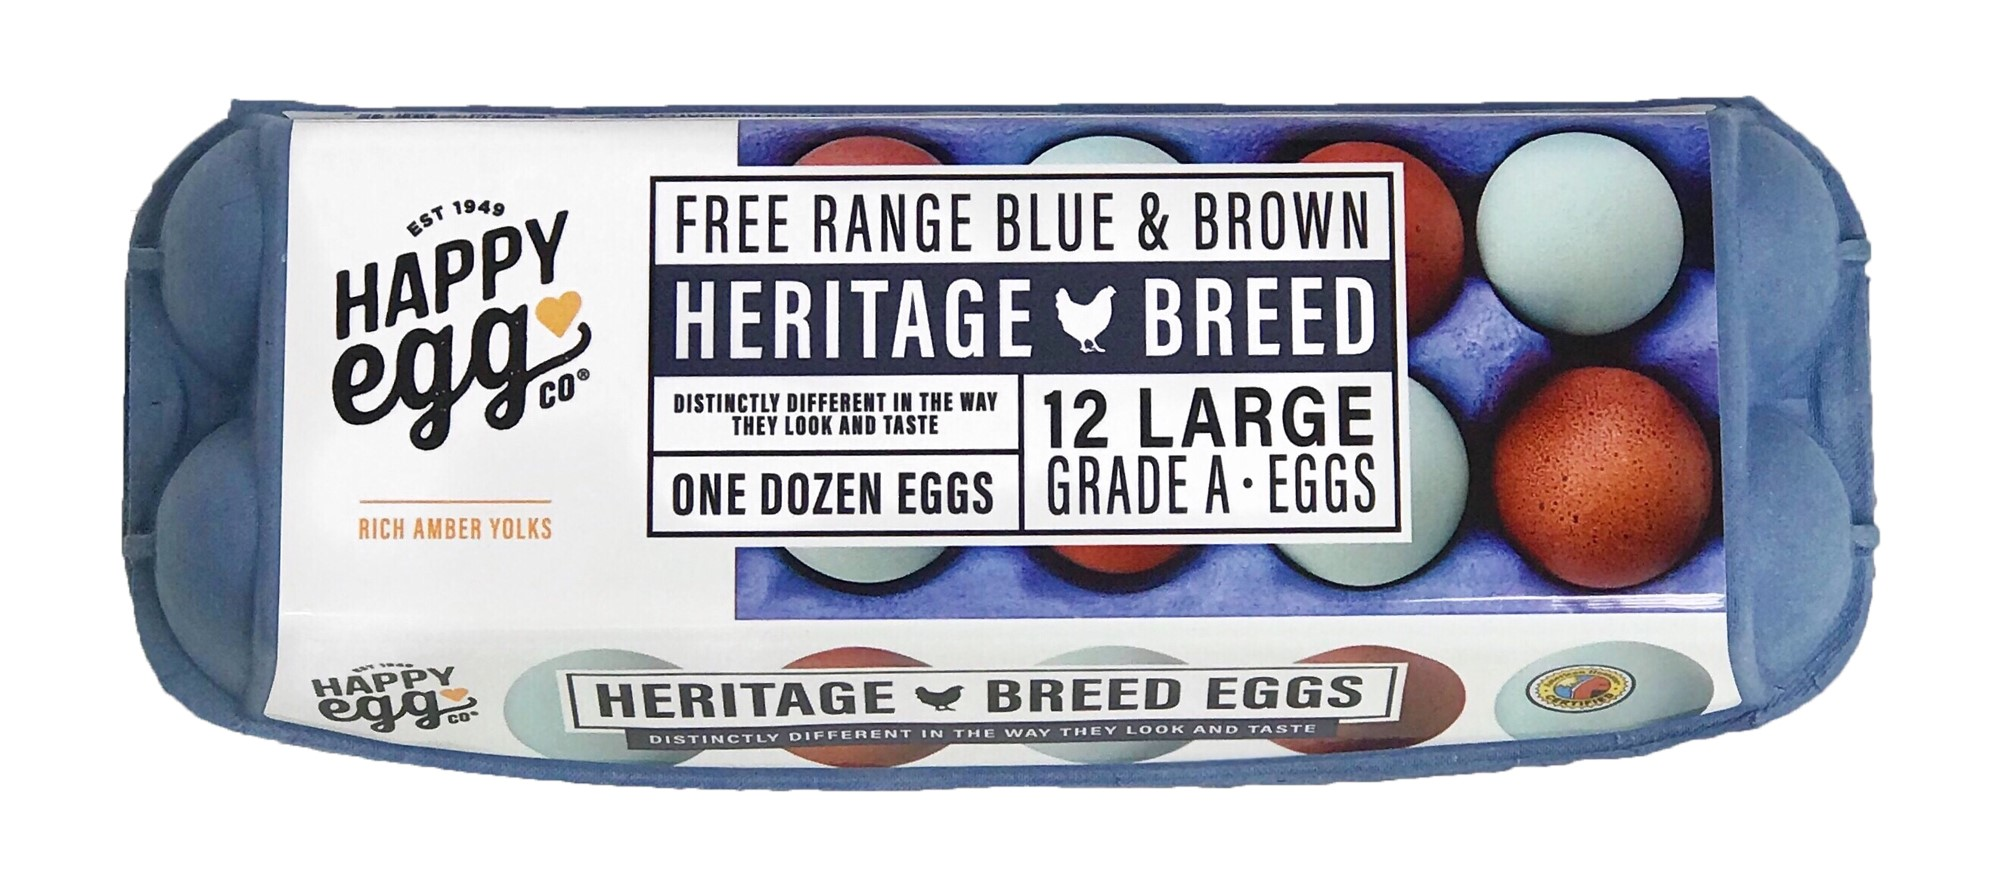 HeritageBreed-Happy-egg-blue-brown-eggs